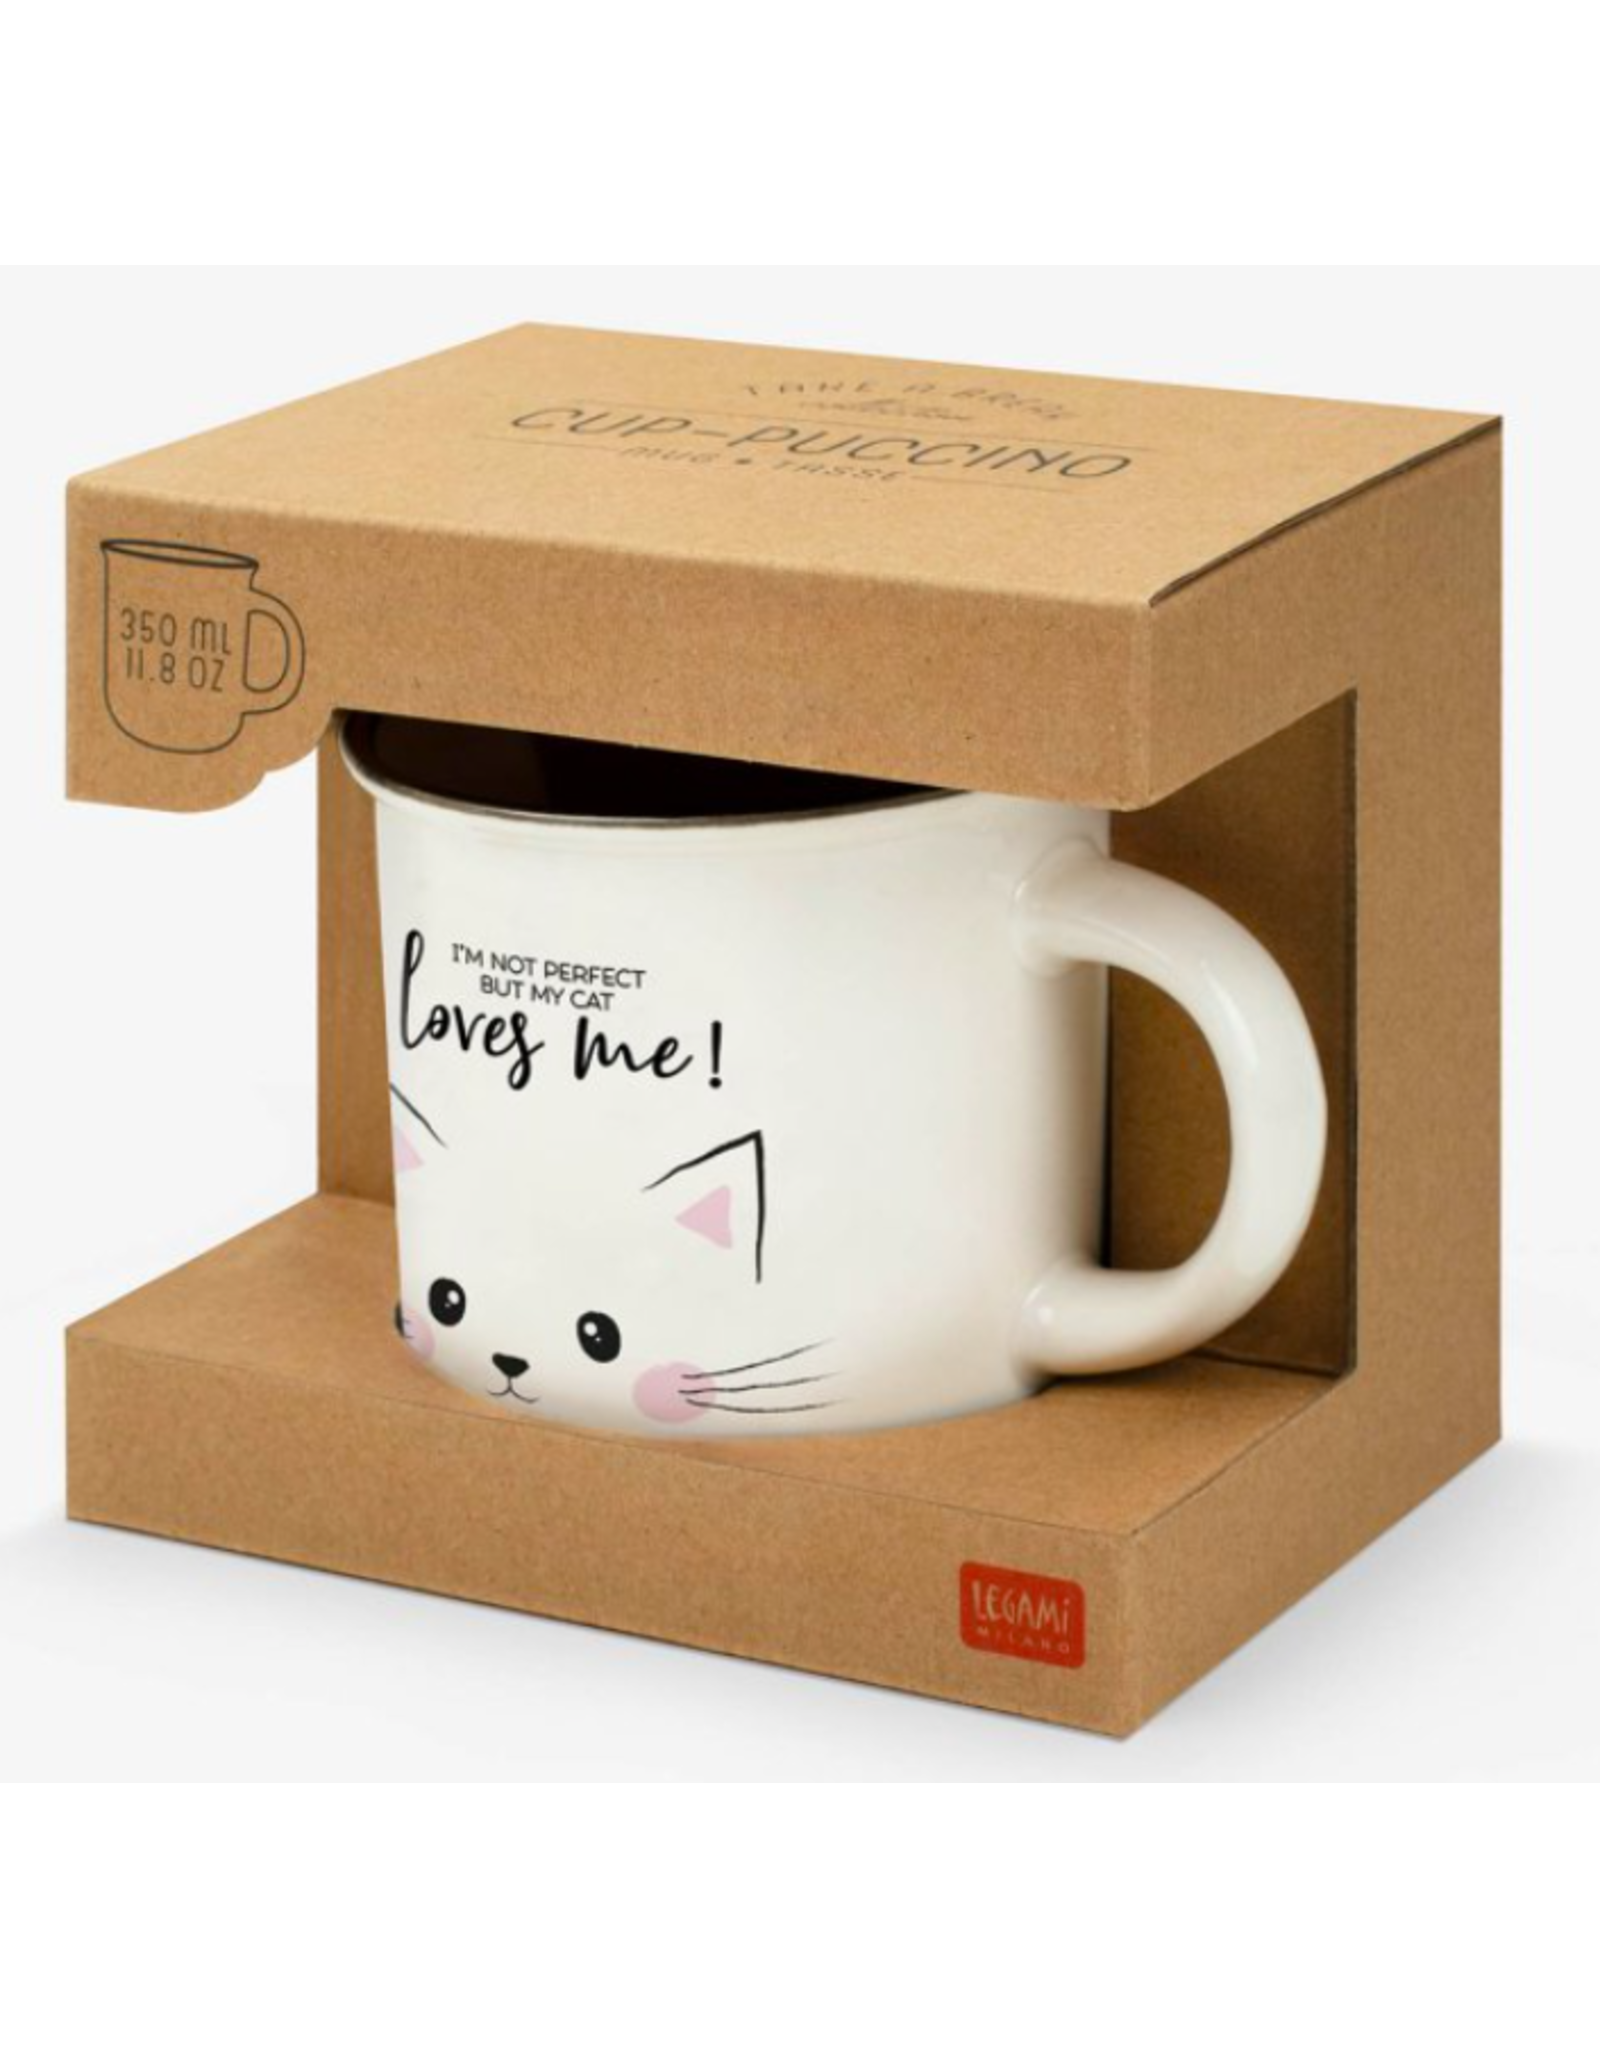 Legami mug puccino - cat